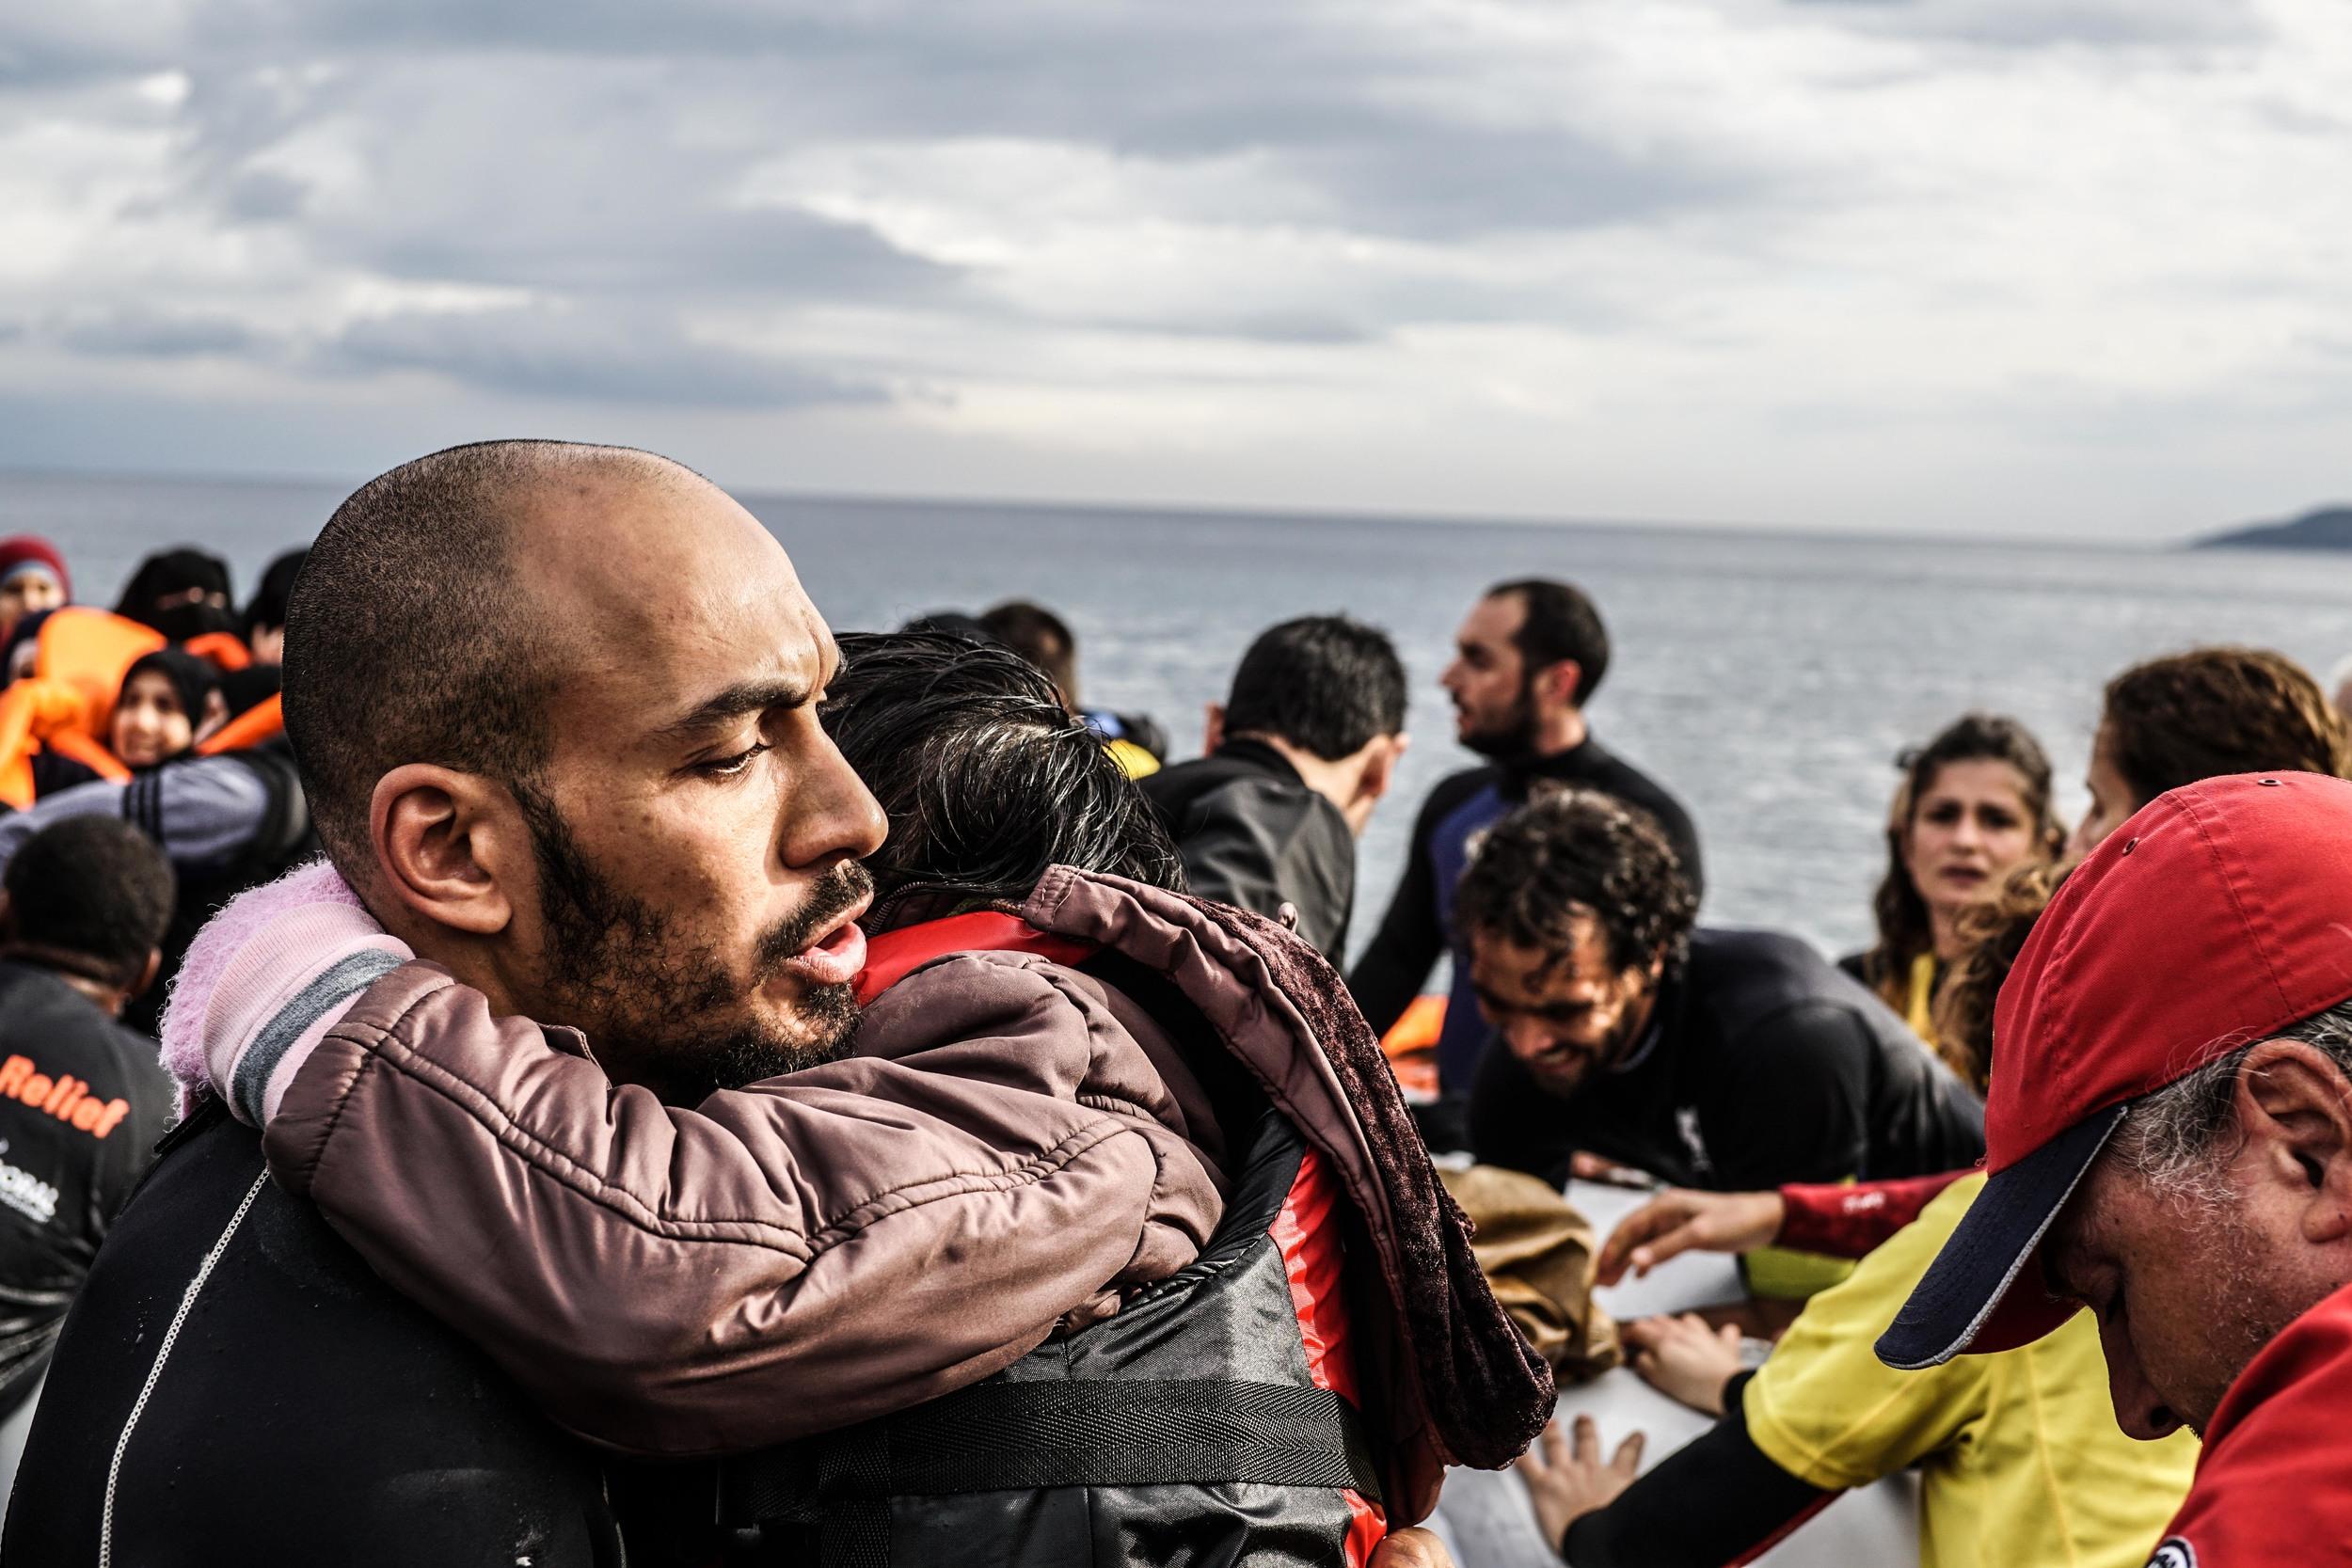 Syrian Refugee Crisis Lesbos Greece November 2015 31.jpg